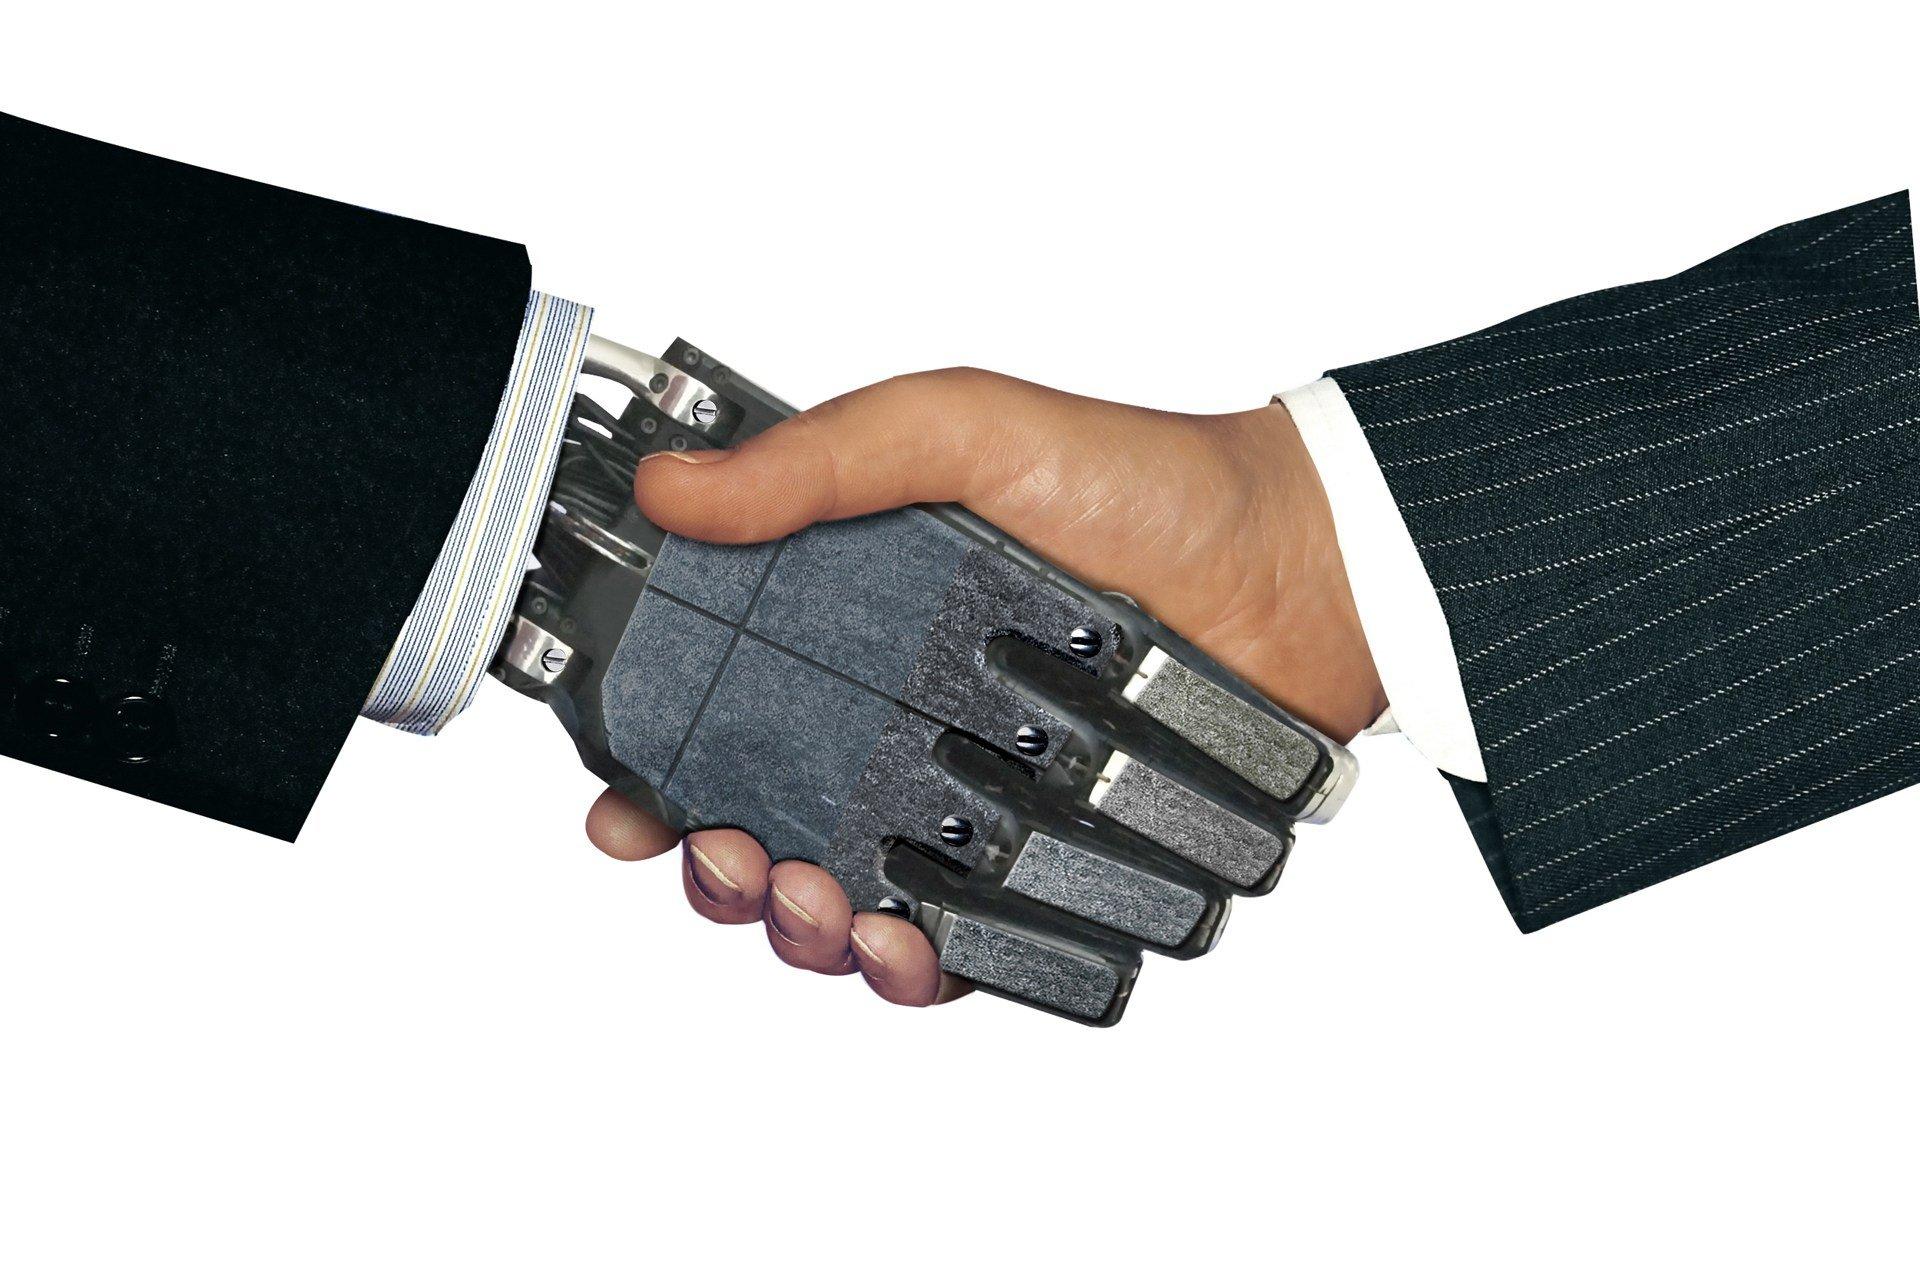 Jemstep Advisor Pro Helps Convert Robo Prospects into Clients